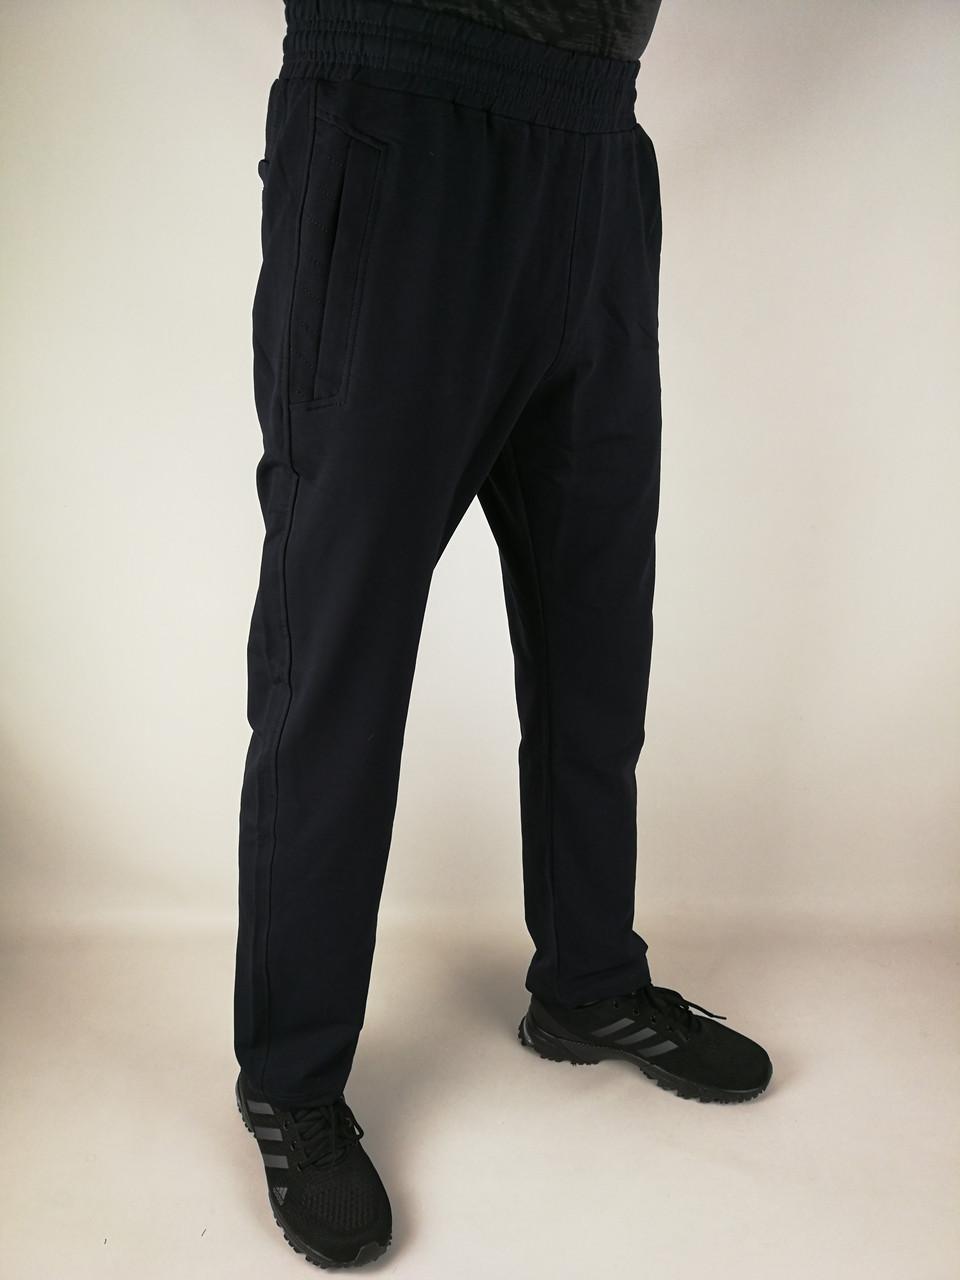 Спортивные штаны для мужчины